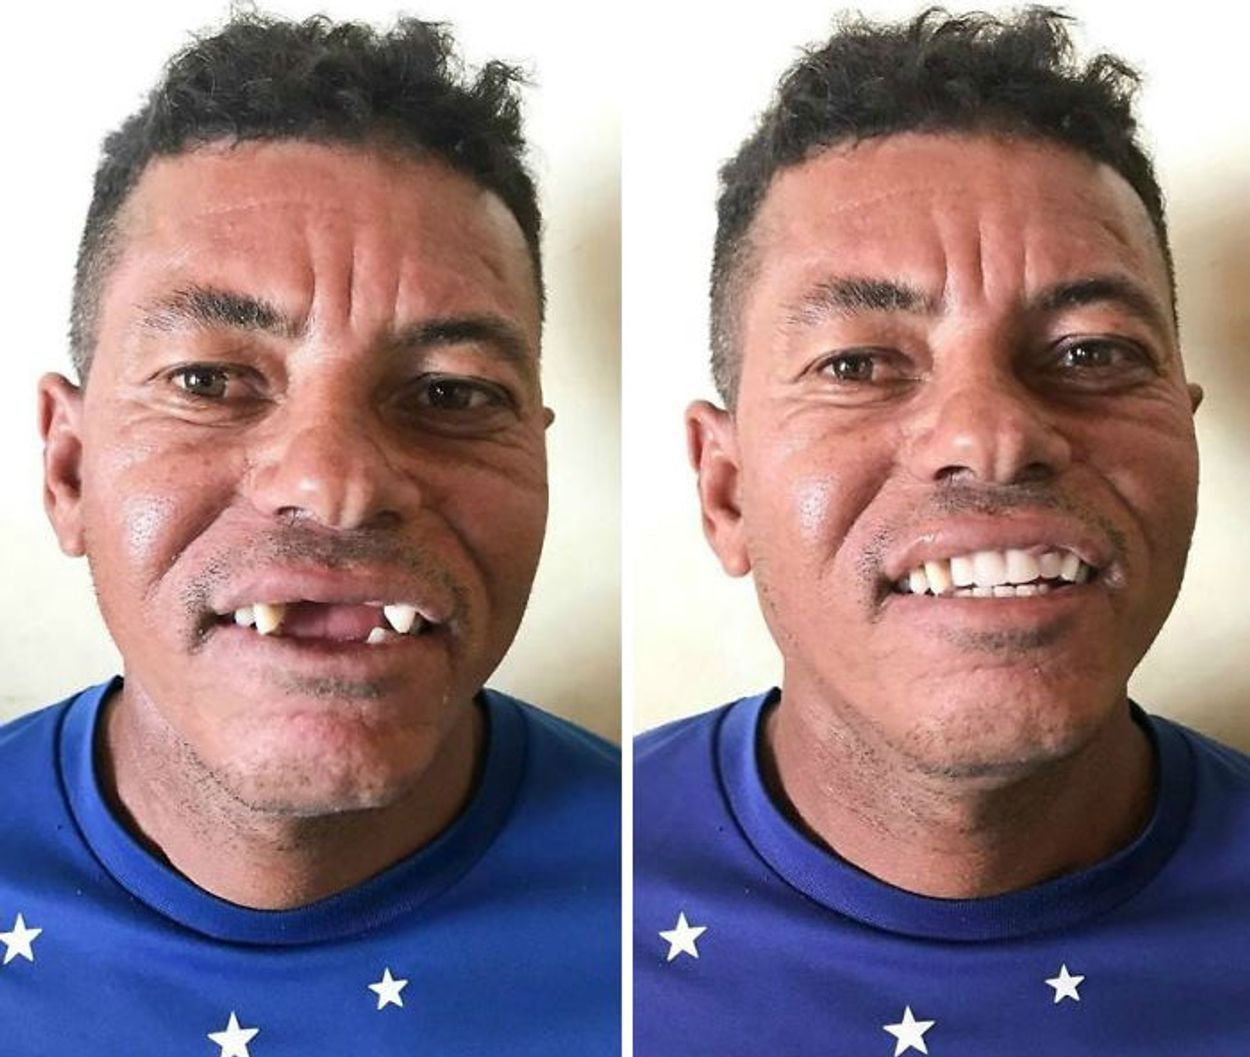 brazilian-dentist-travel-poor-people-teeth-fix-felipe-rossi-43-5db954348afc6__700